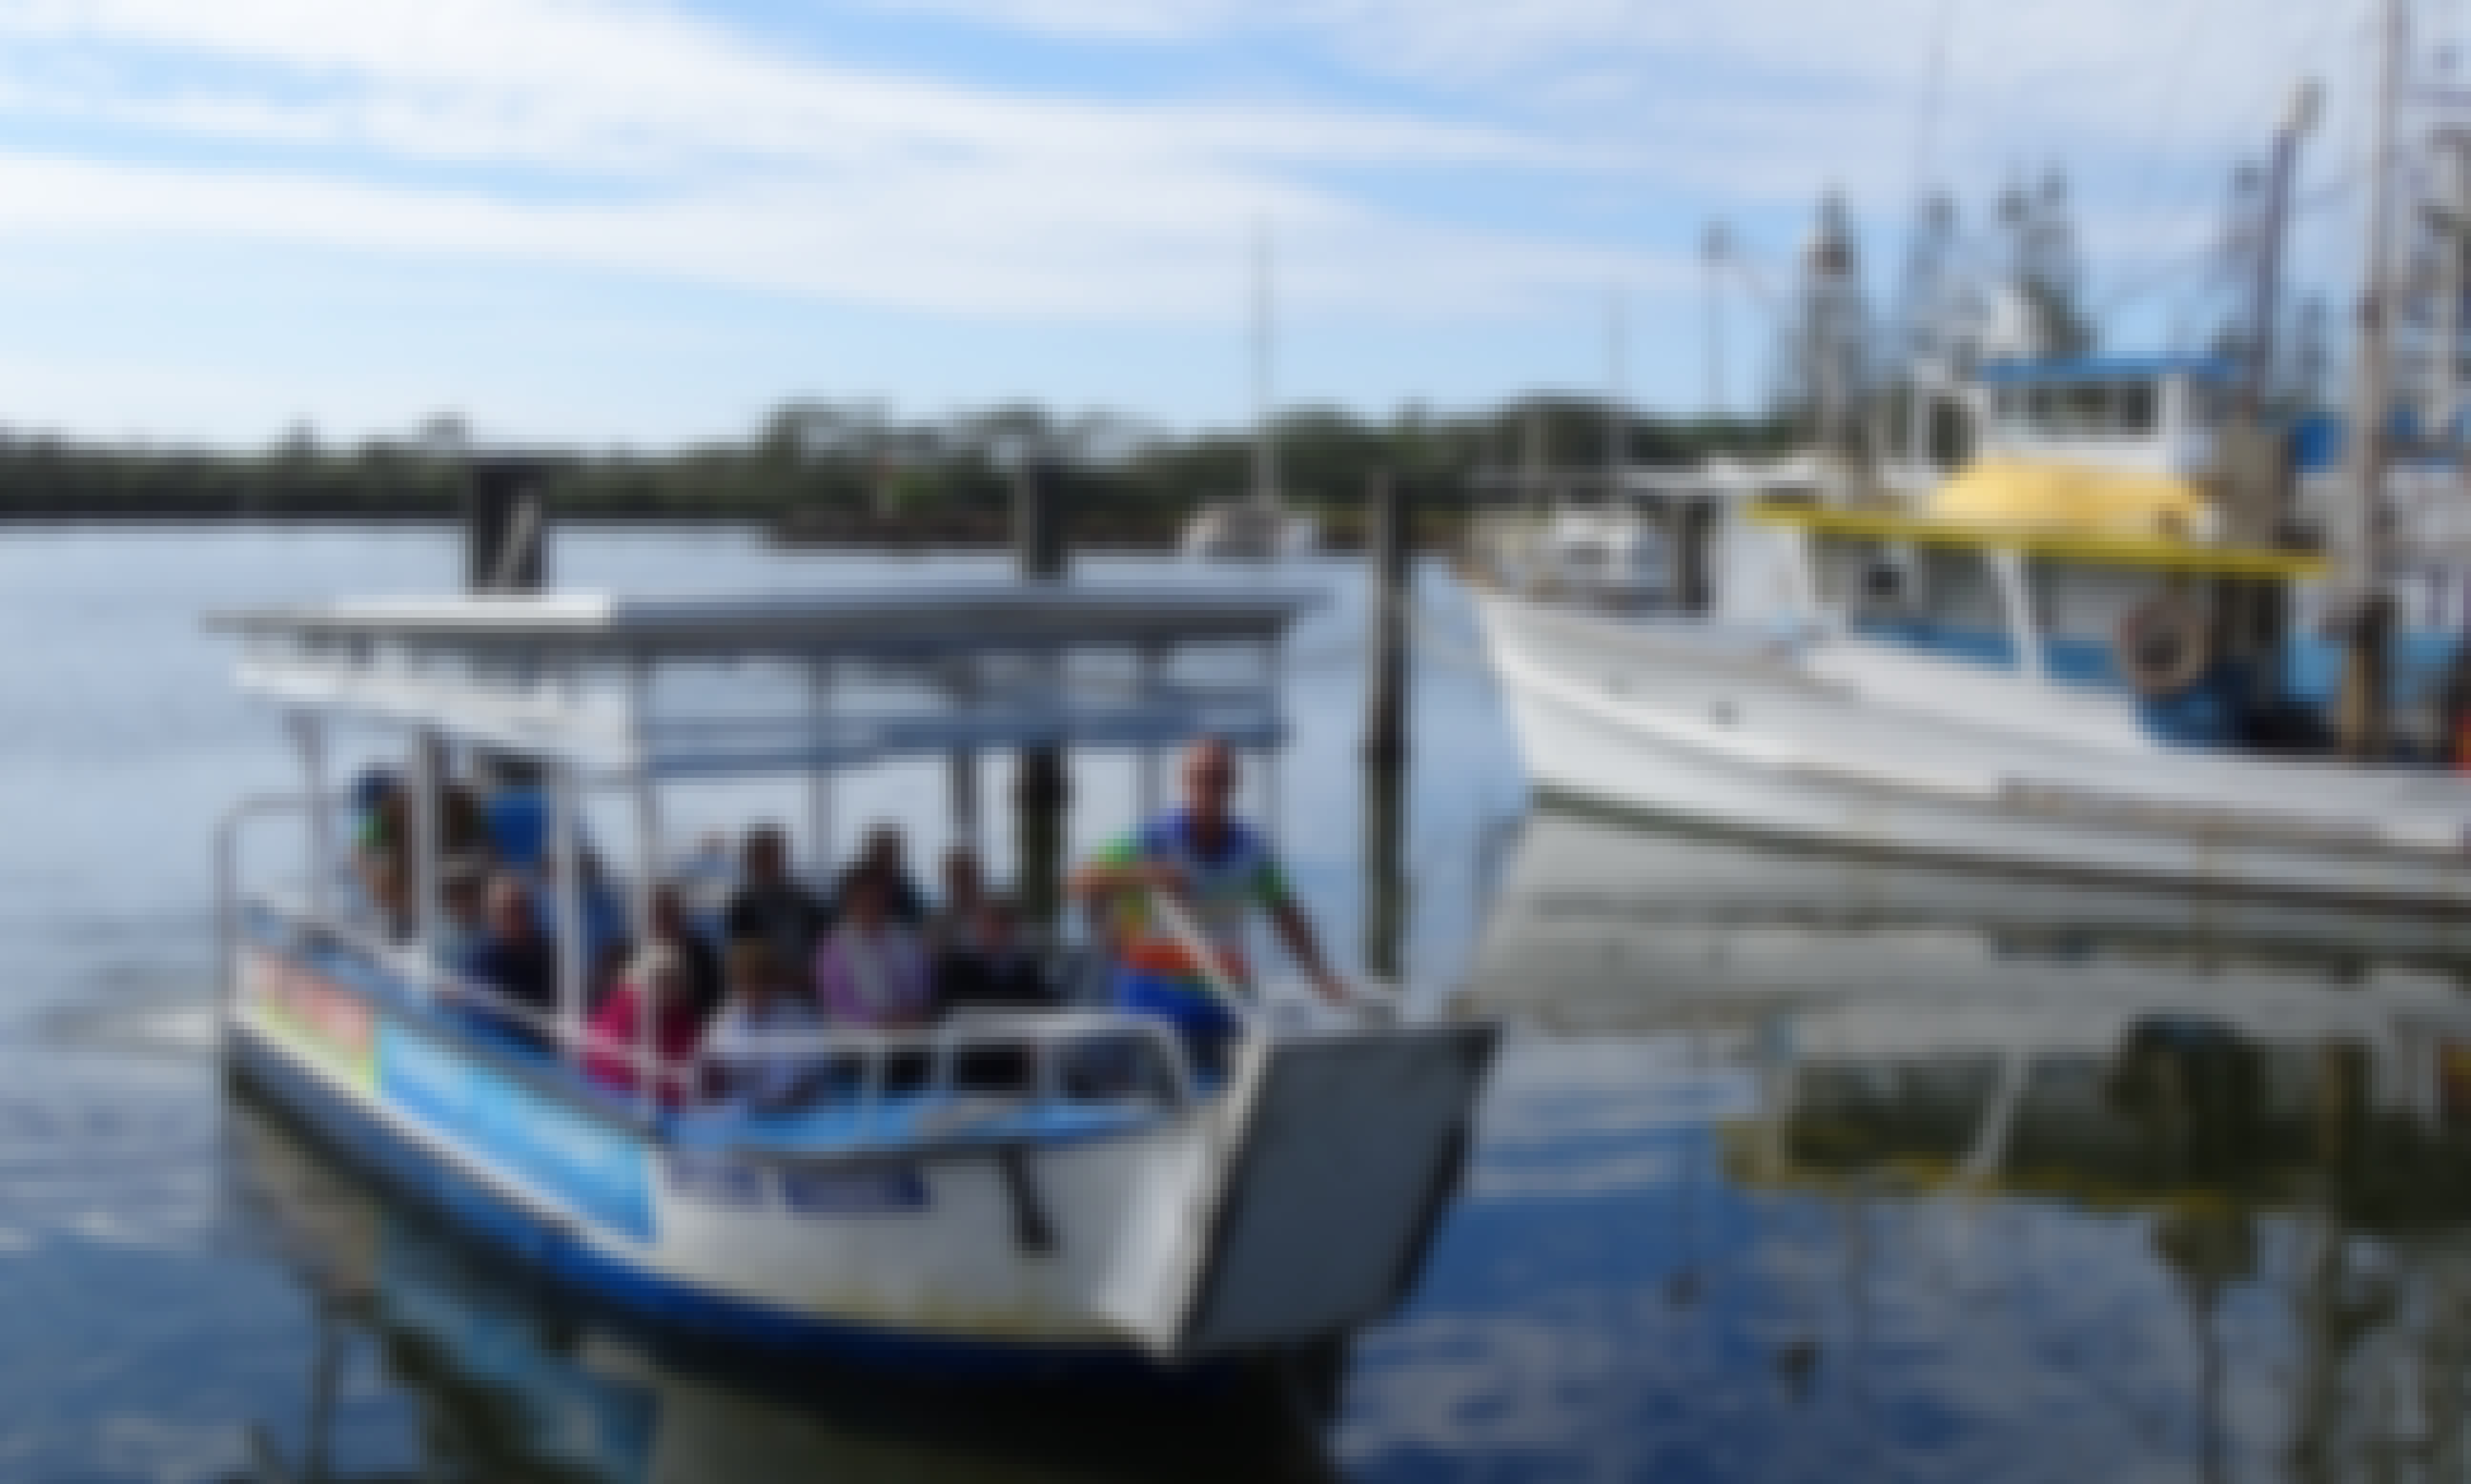 Passenger Boat Rental in Brunswick Heads